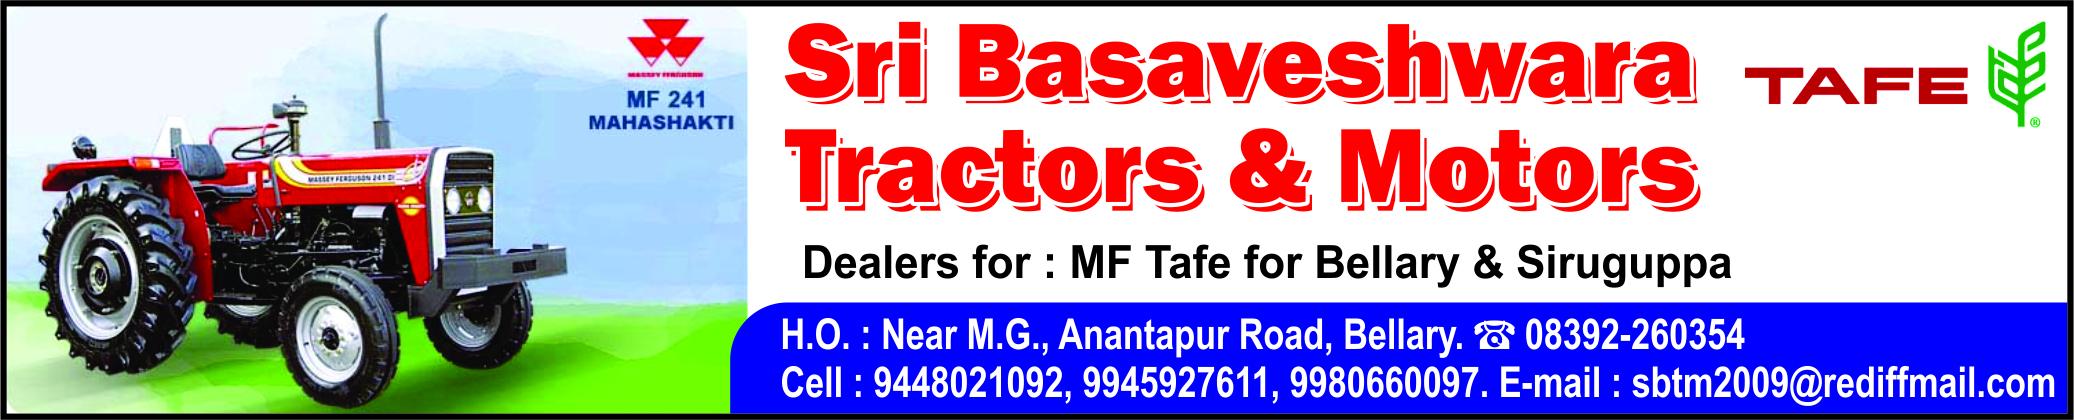 Sri Basaveshwara Tractors & Motors